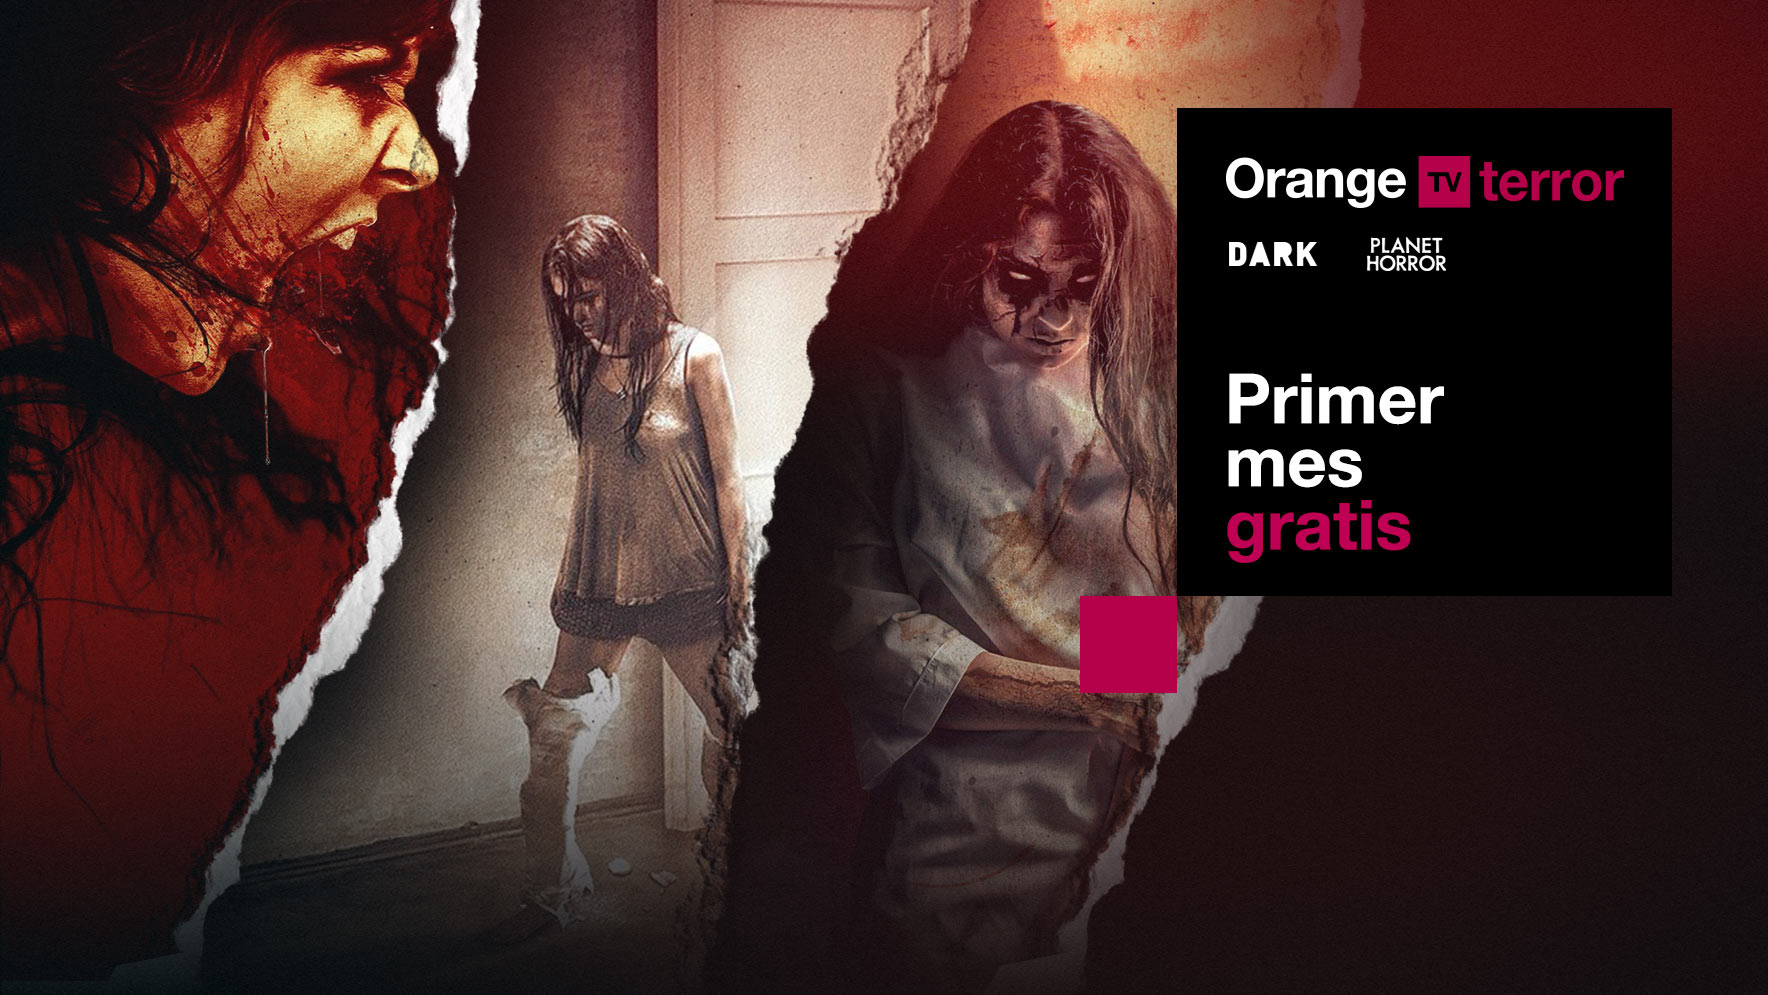 Orange TV lanza Terror